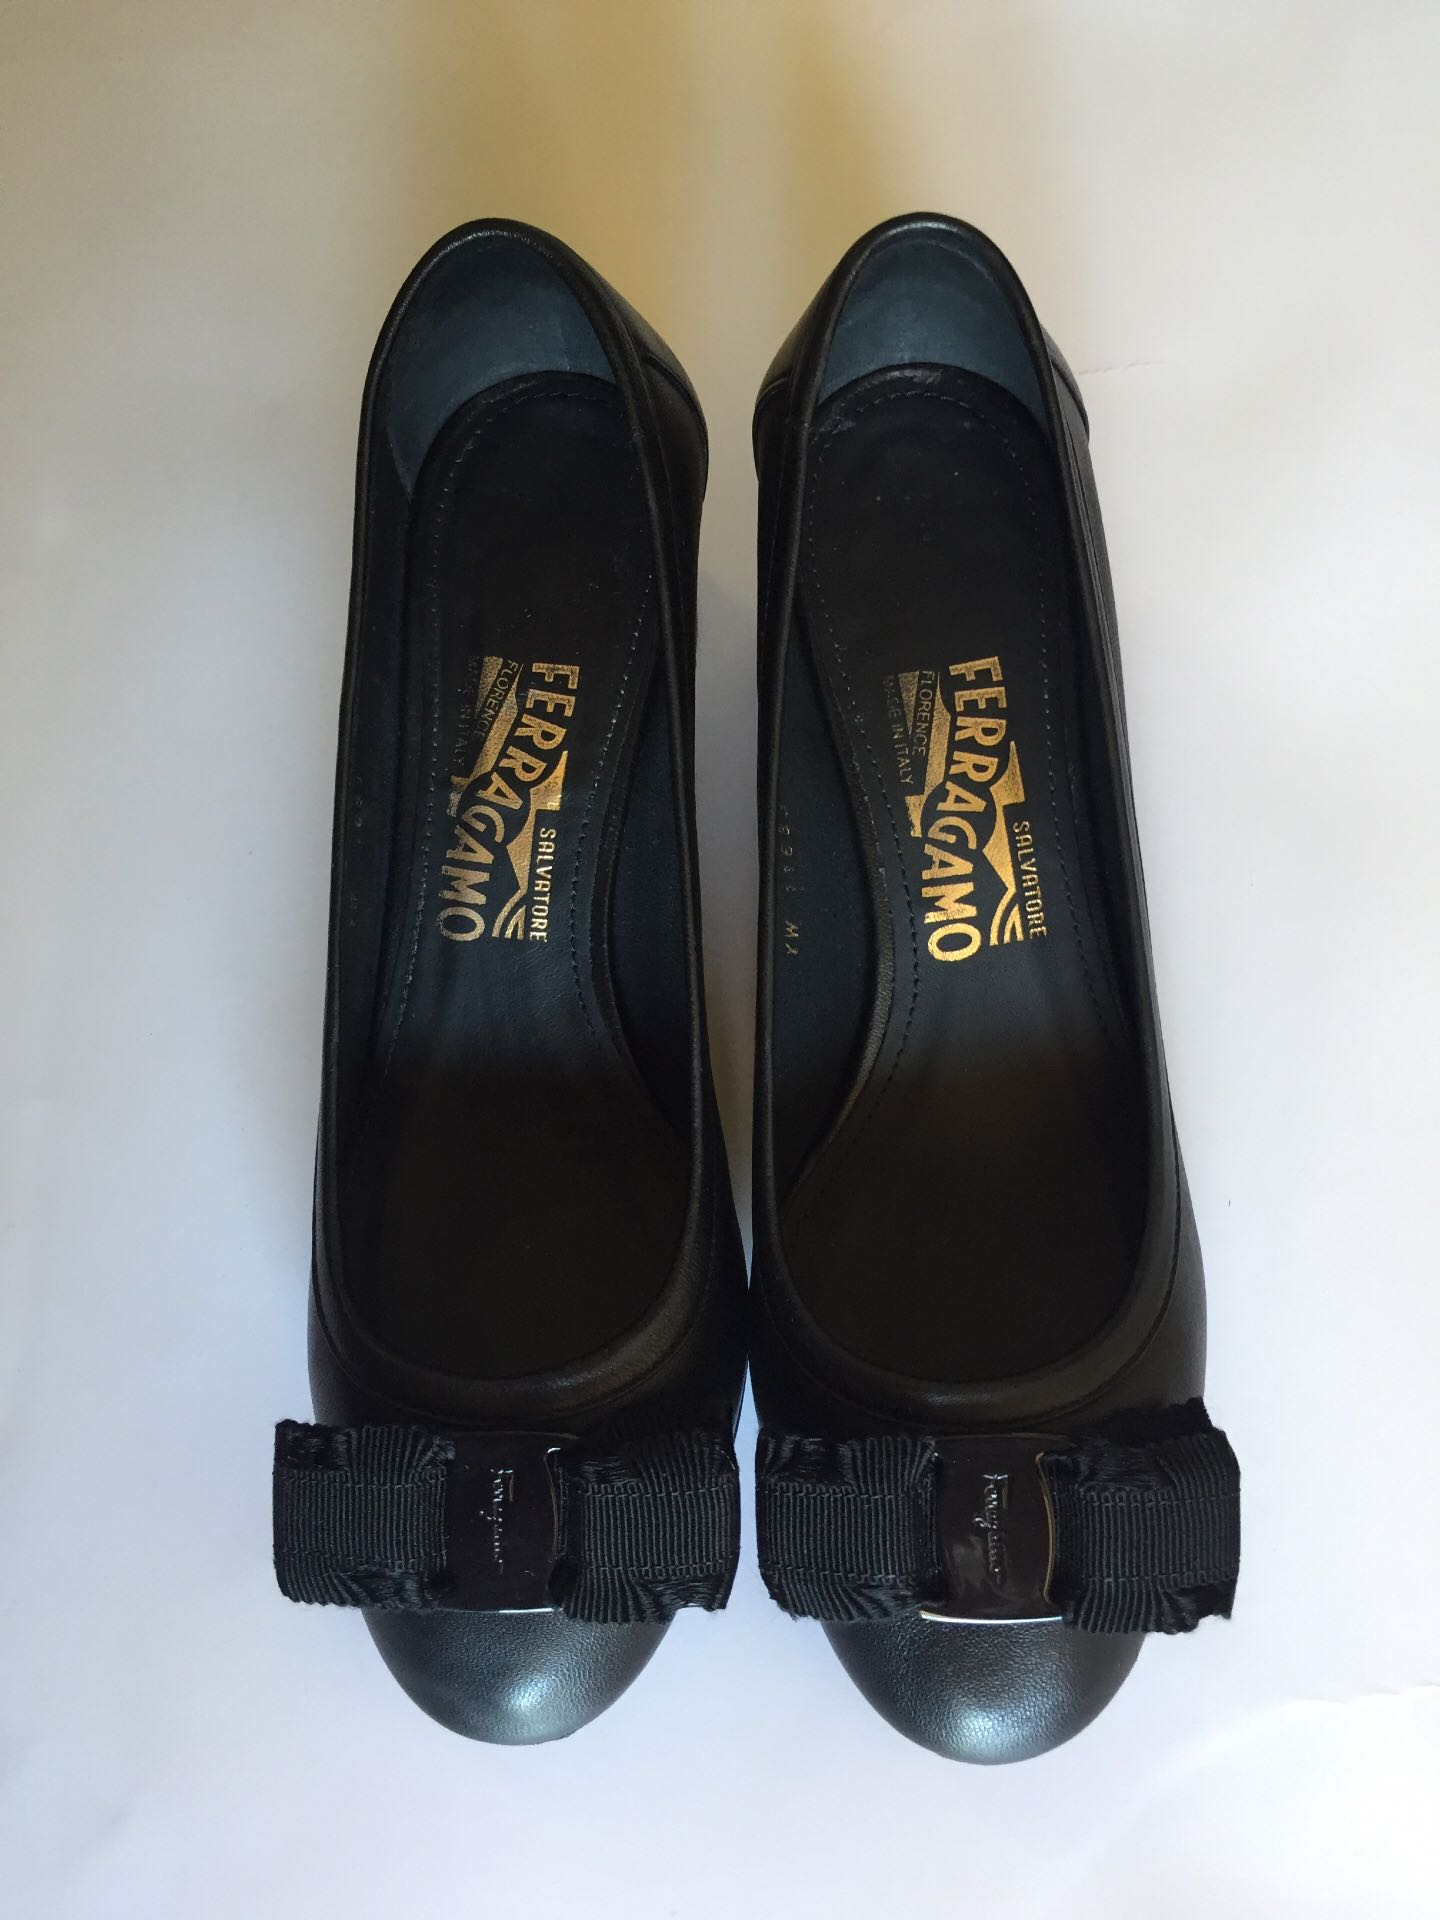 Salvatore Ferragamo Elvin 40 Black Leather Shoes Size 7